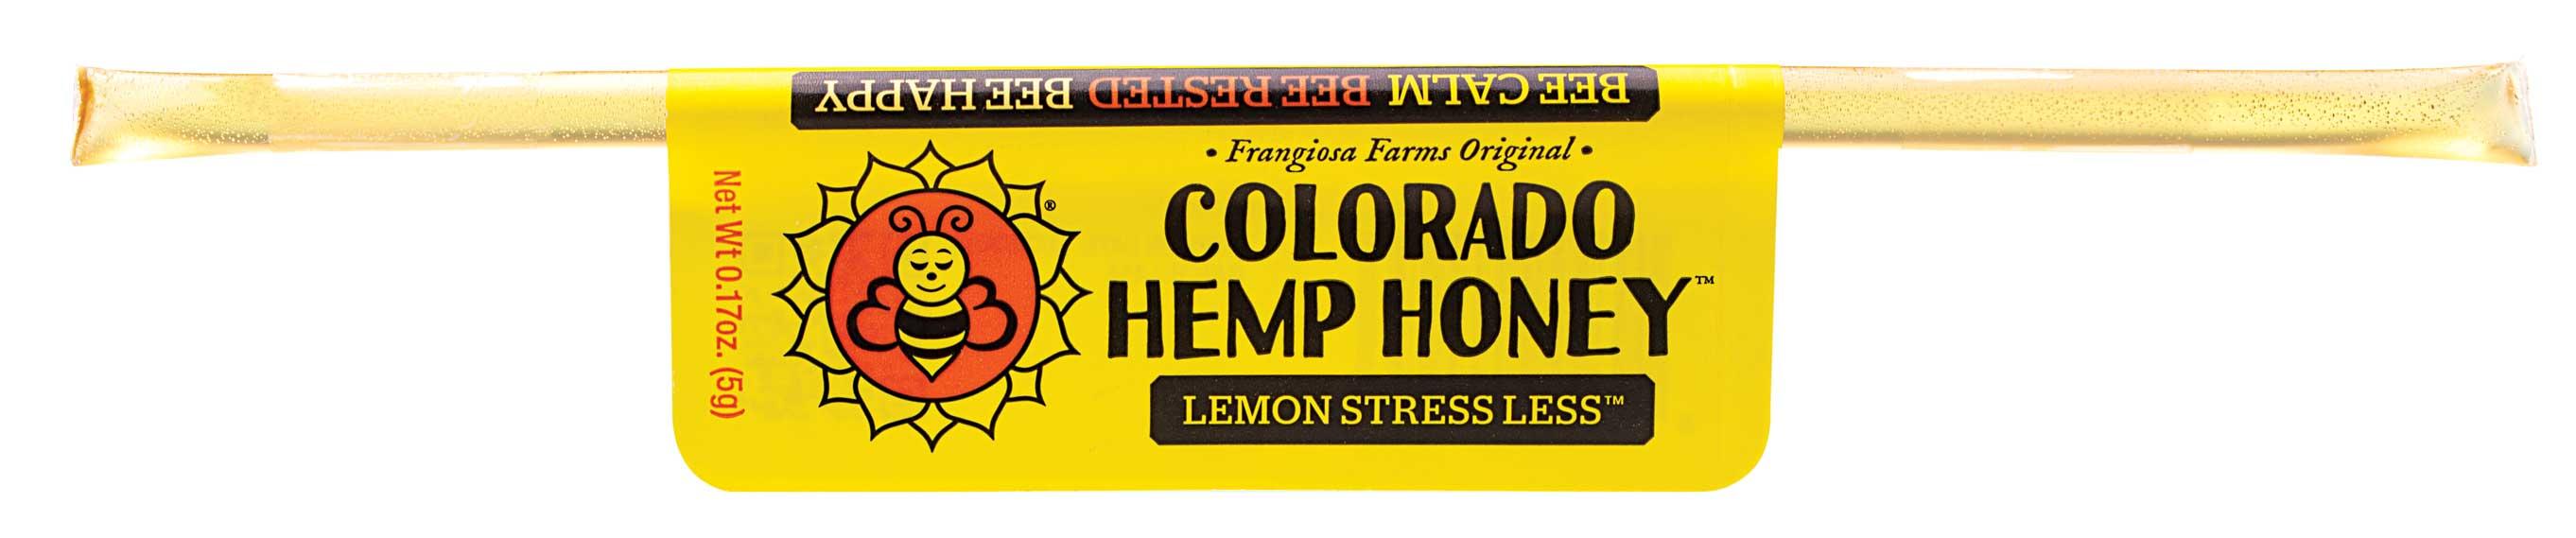 Colorado Honey Lemon Stress Less FS Extract Sticks, 1-count (15-mg)